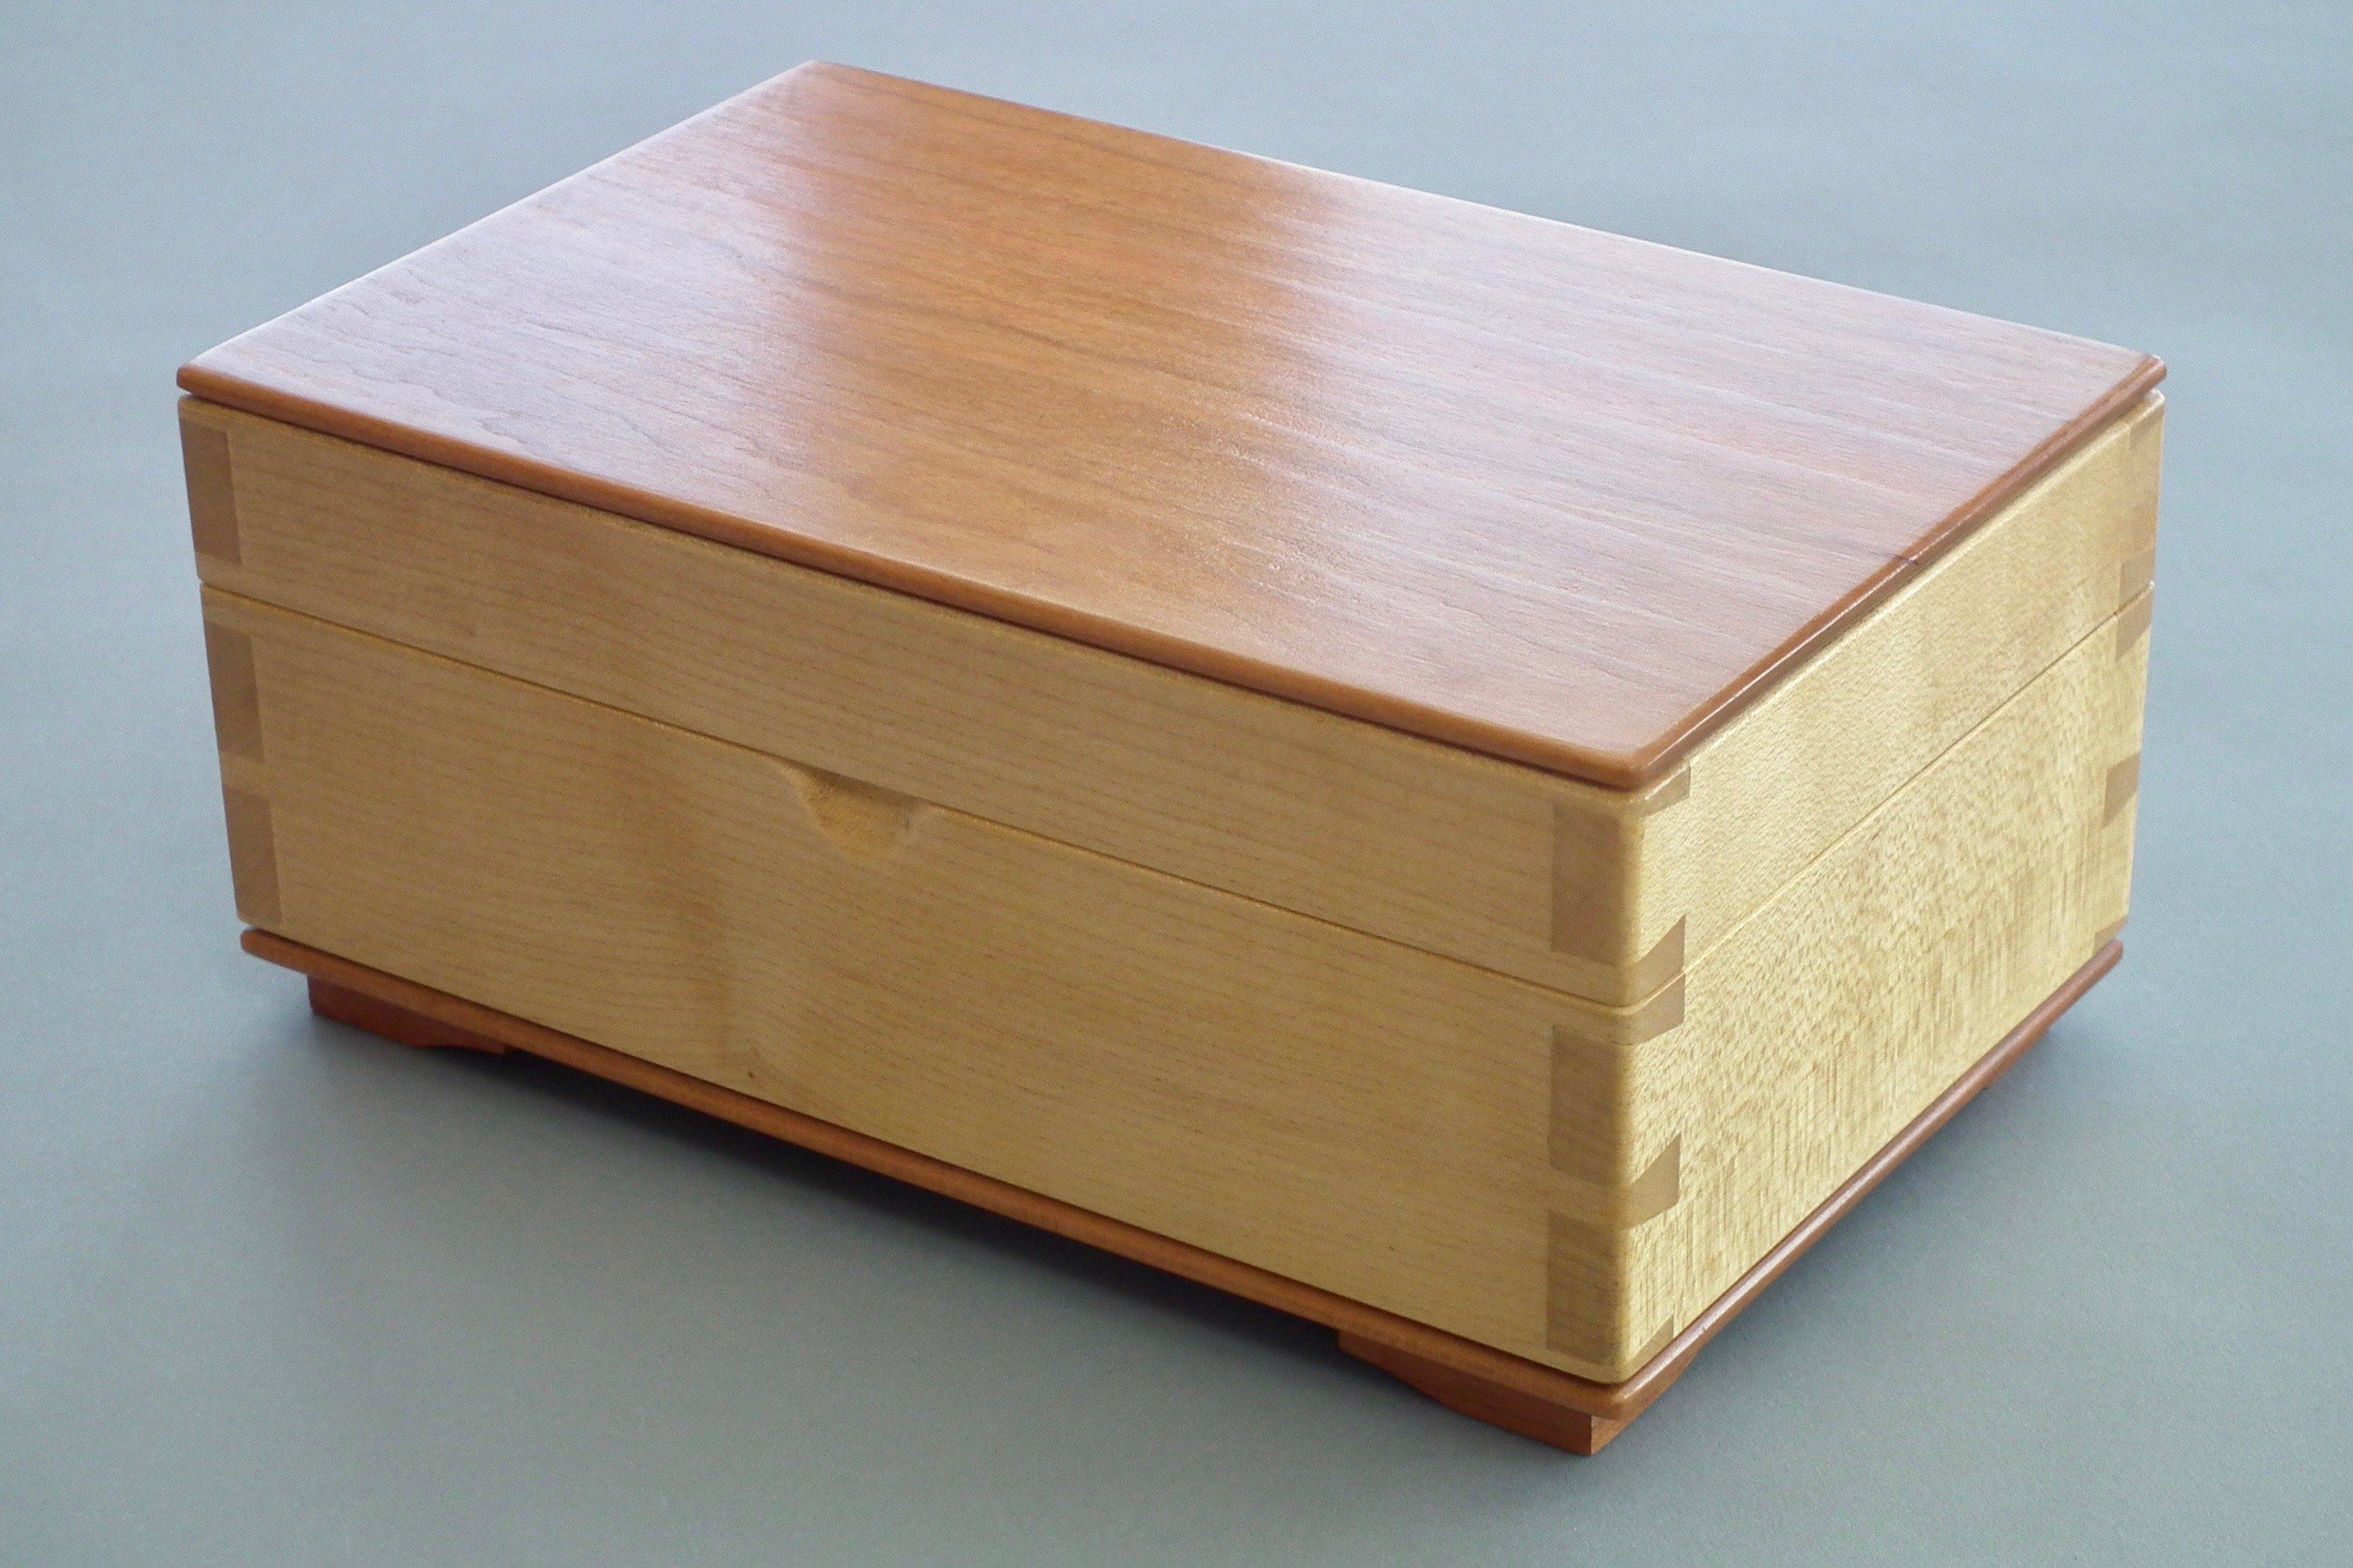 Keepsake Box by Chris Bailey